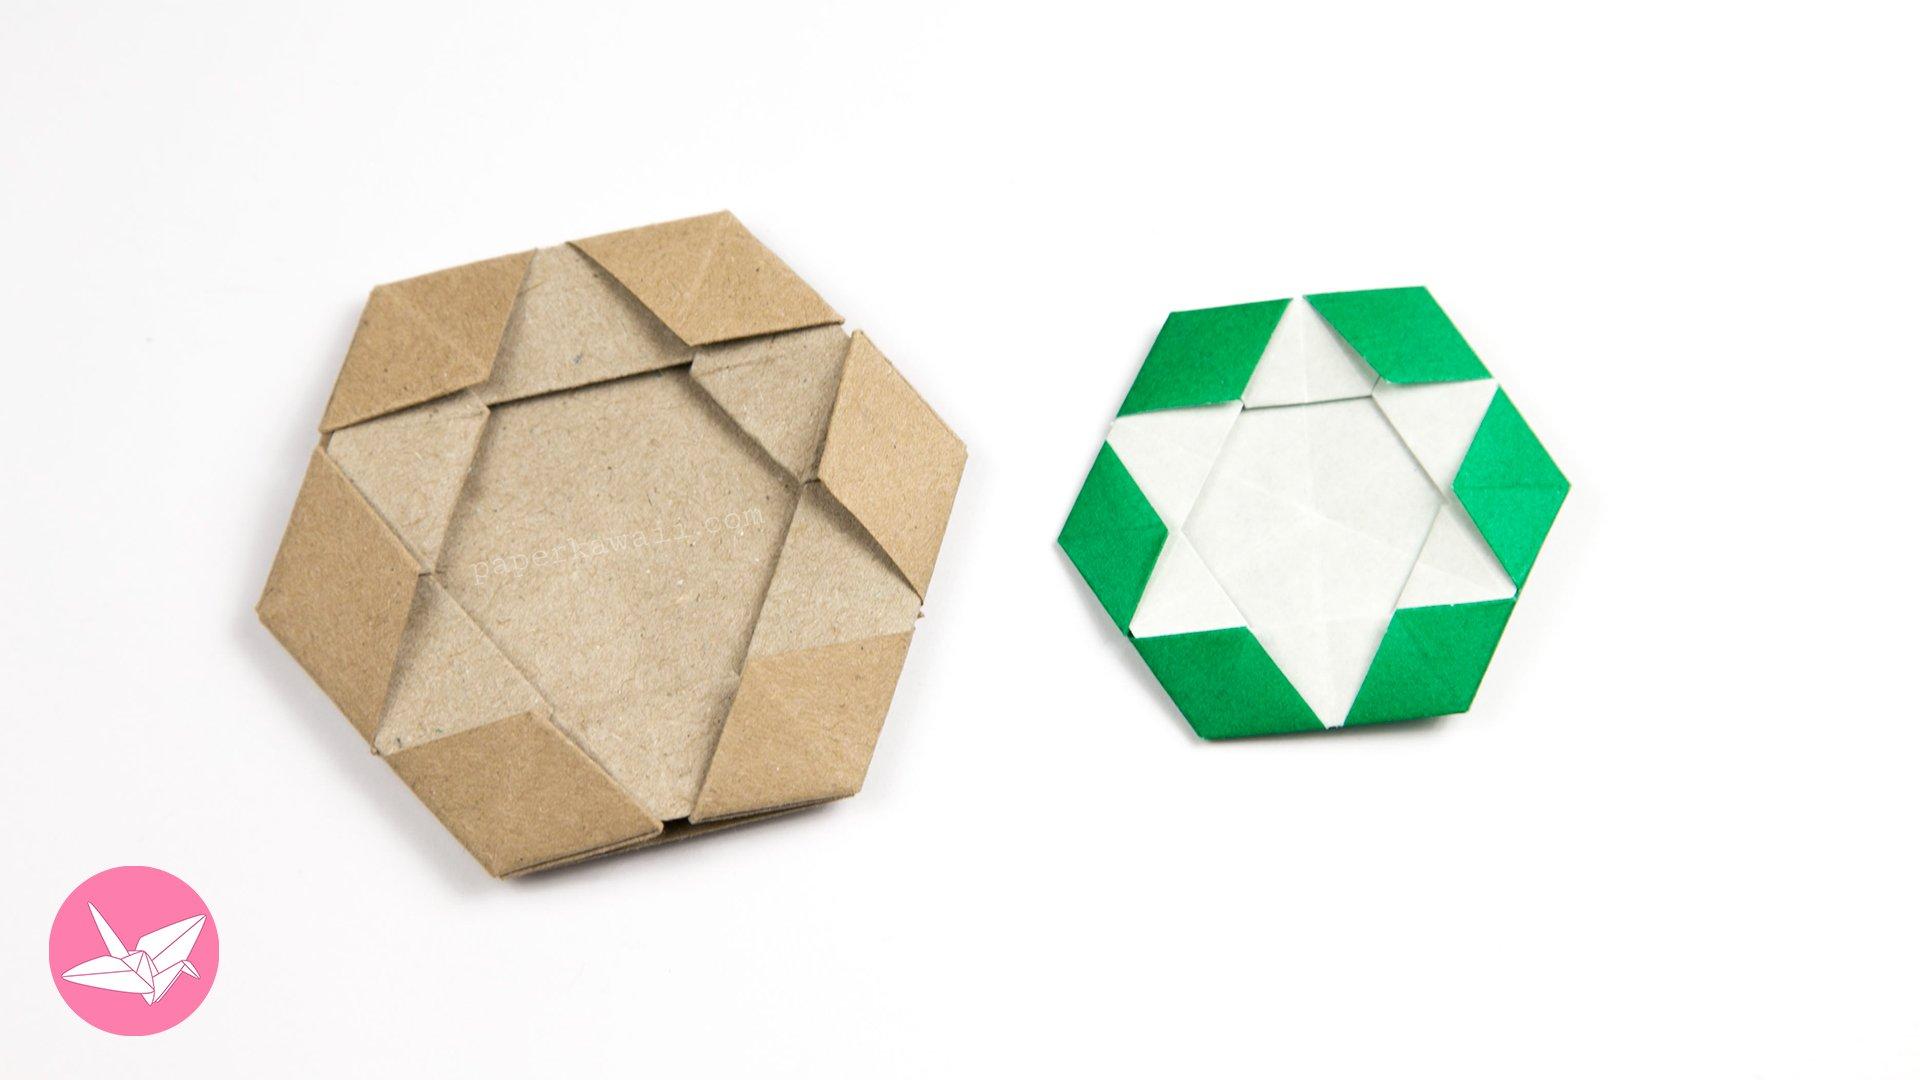 Origami Star of David Hexagram Coaster / Tiles / Tato via @paper_kawaii